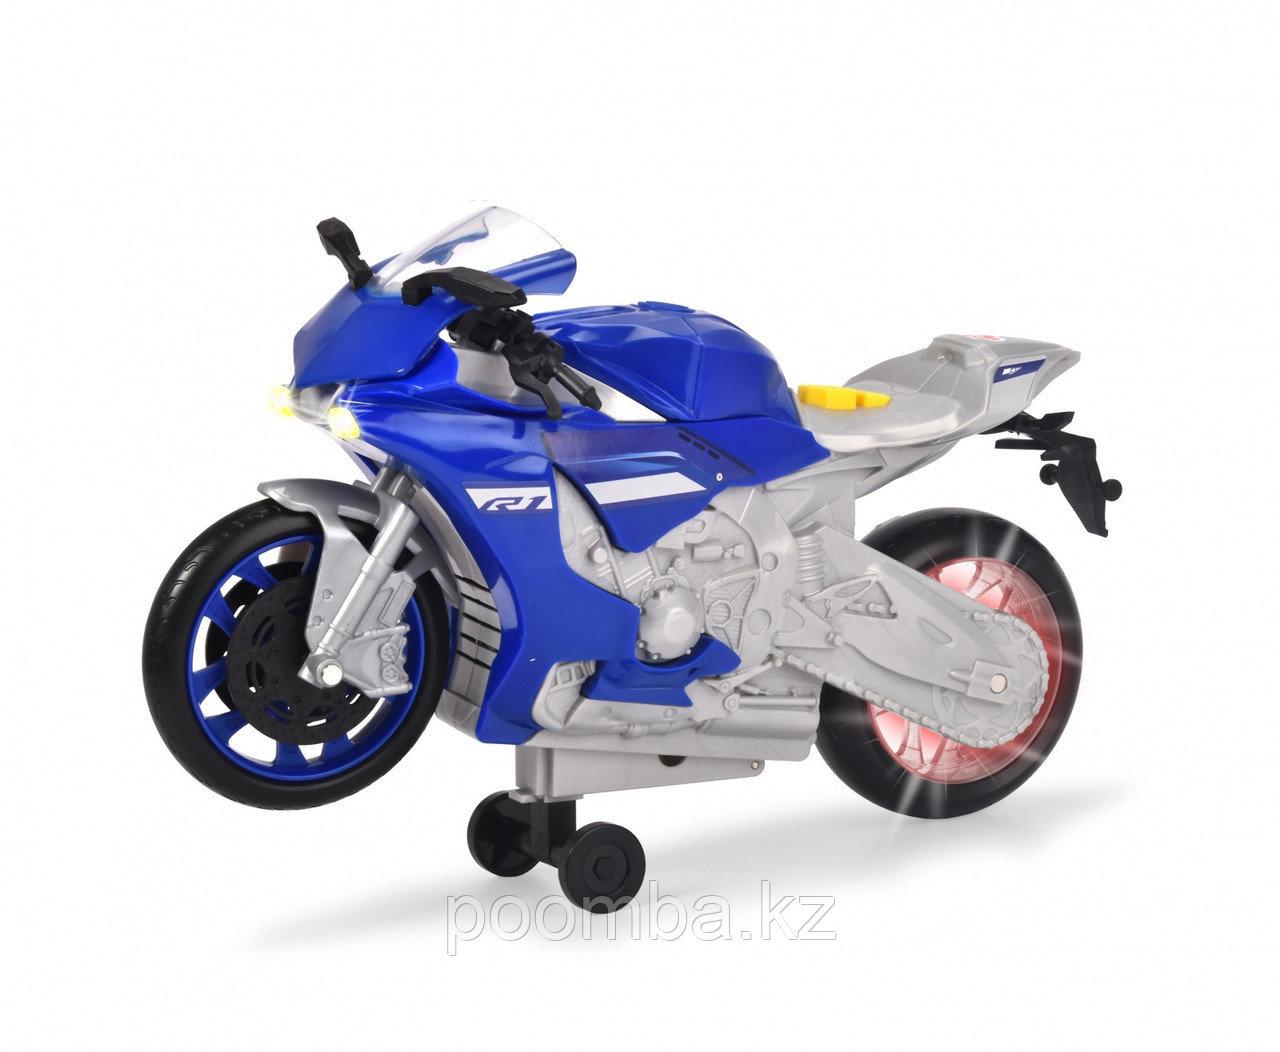 Мотоцикл Yamaha R1 26 см свет звук Dickie Toys